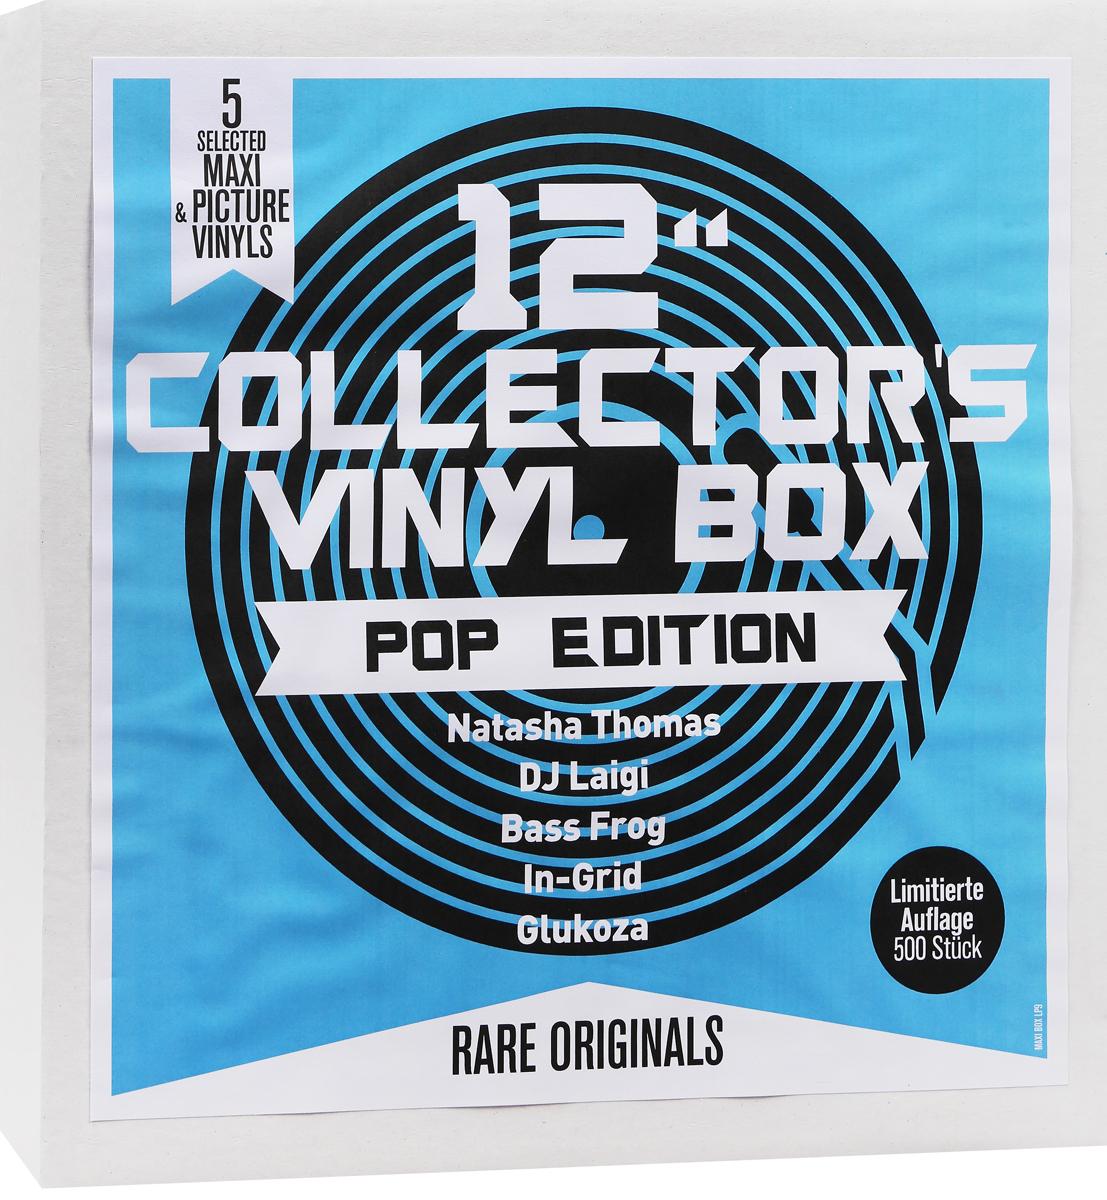 "12"" Collector's Vinyl Box. Pop Edition (5 LP)"